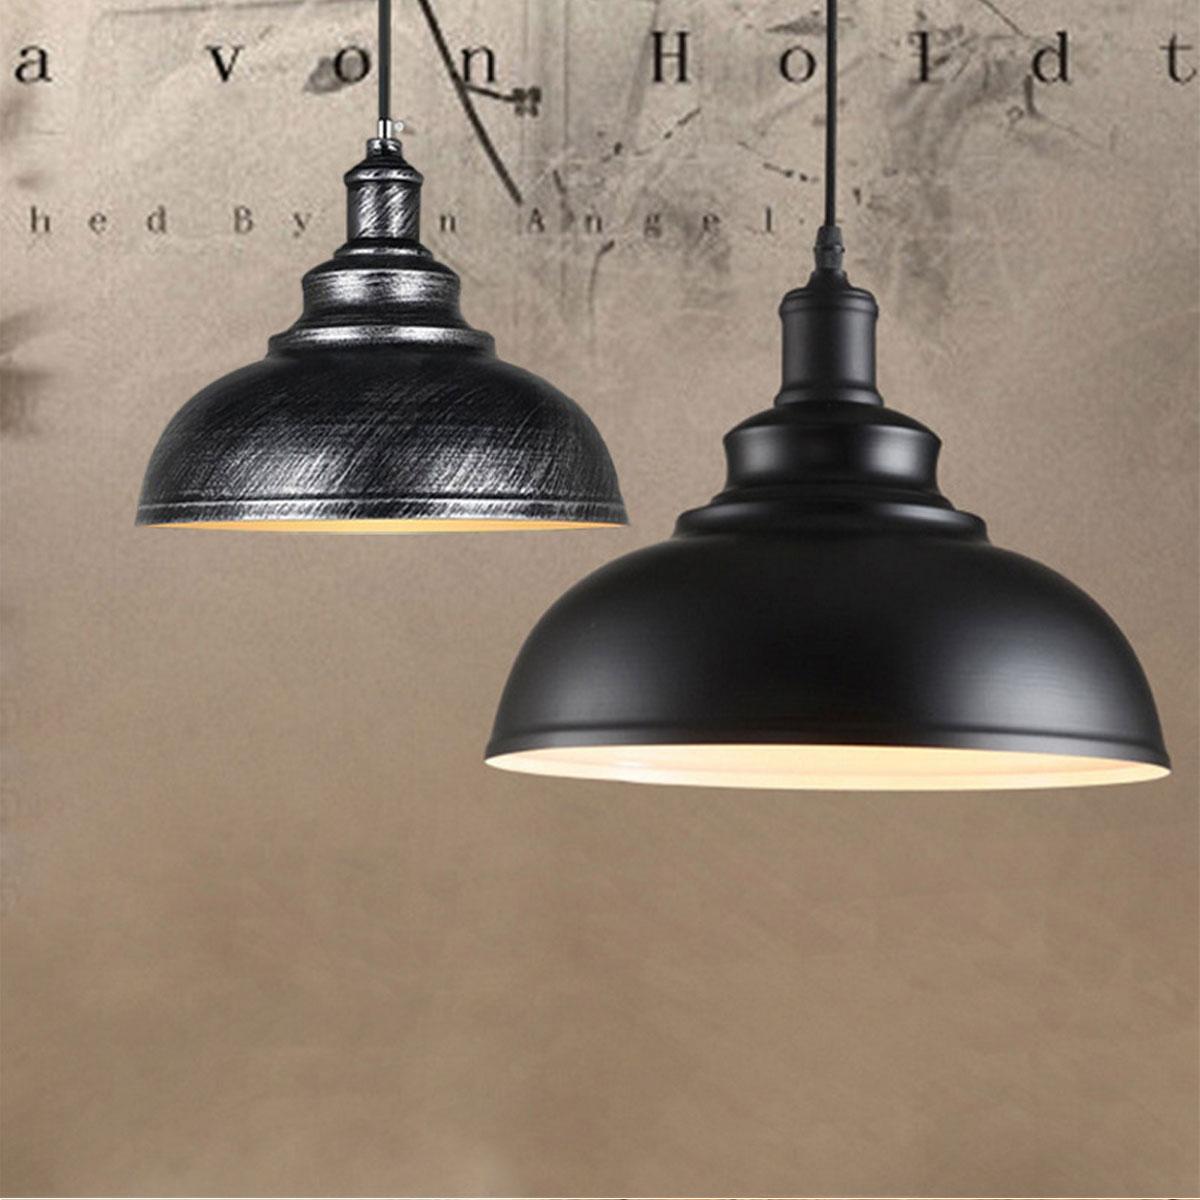 Vintage Pendant Lamp Iron Loft Retro E27 Industrial Bar Restaurant Lighting Hanging Chandelier Decorative Lampshade Pendant Lights     - title=